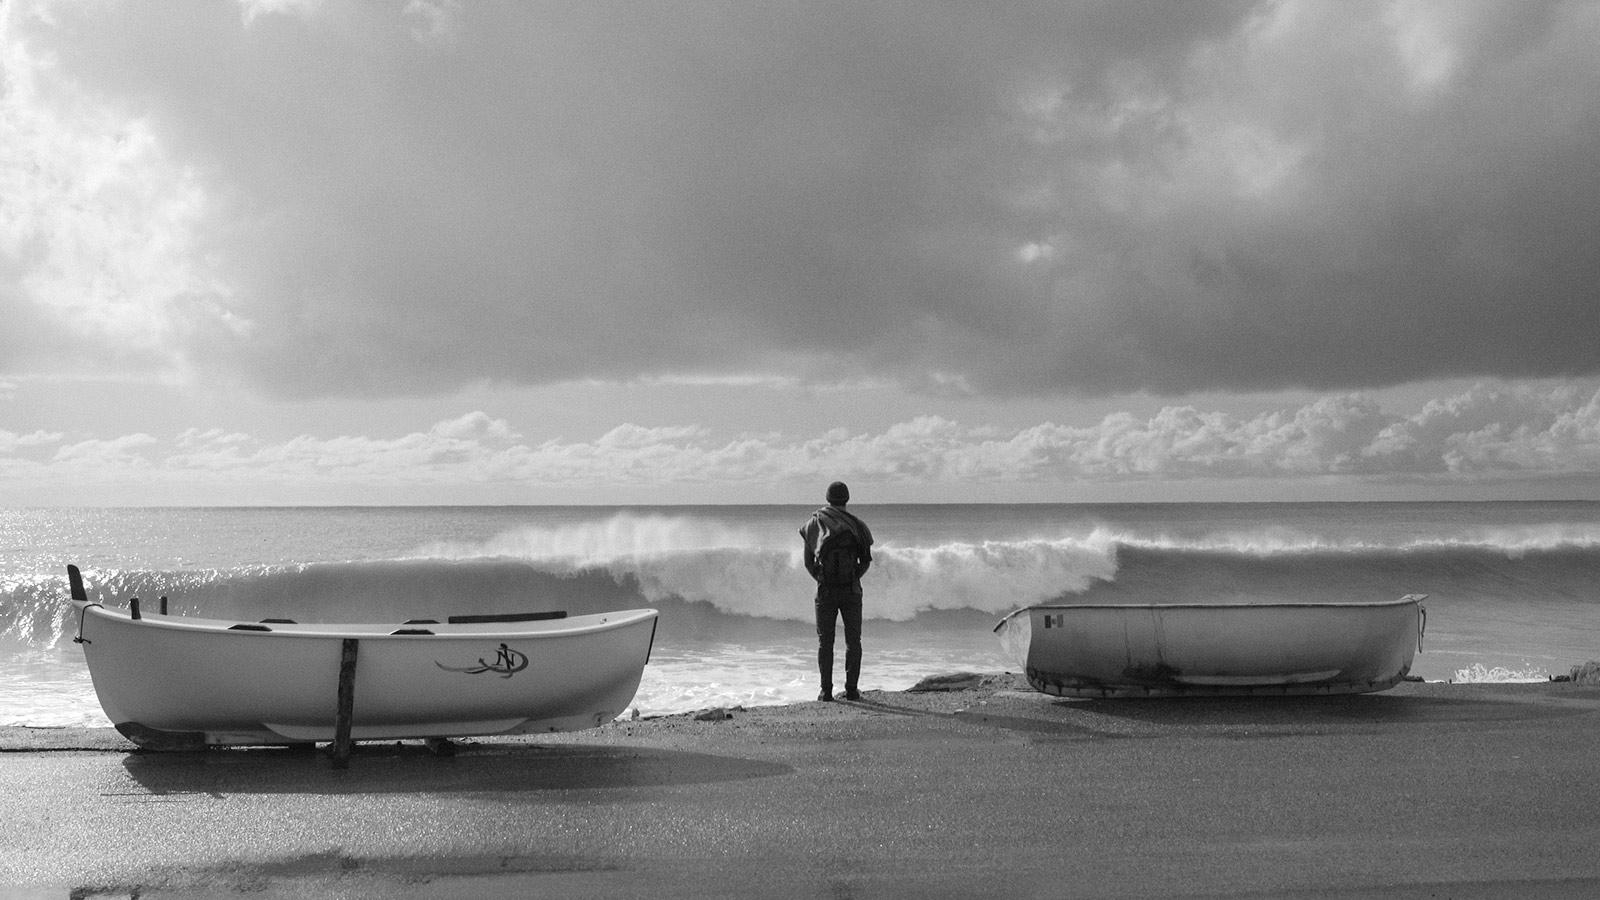 3000km_roberto_damico_leonardo_fioravanti_surfculture